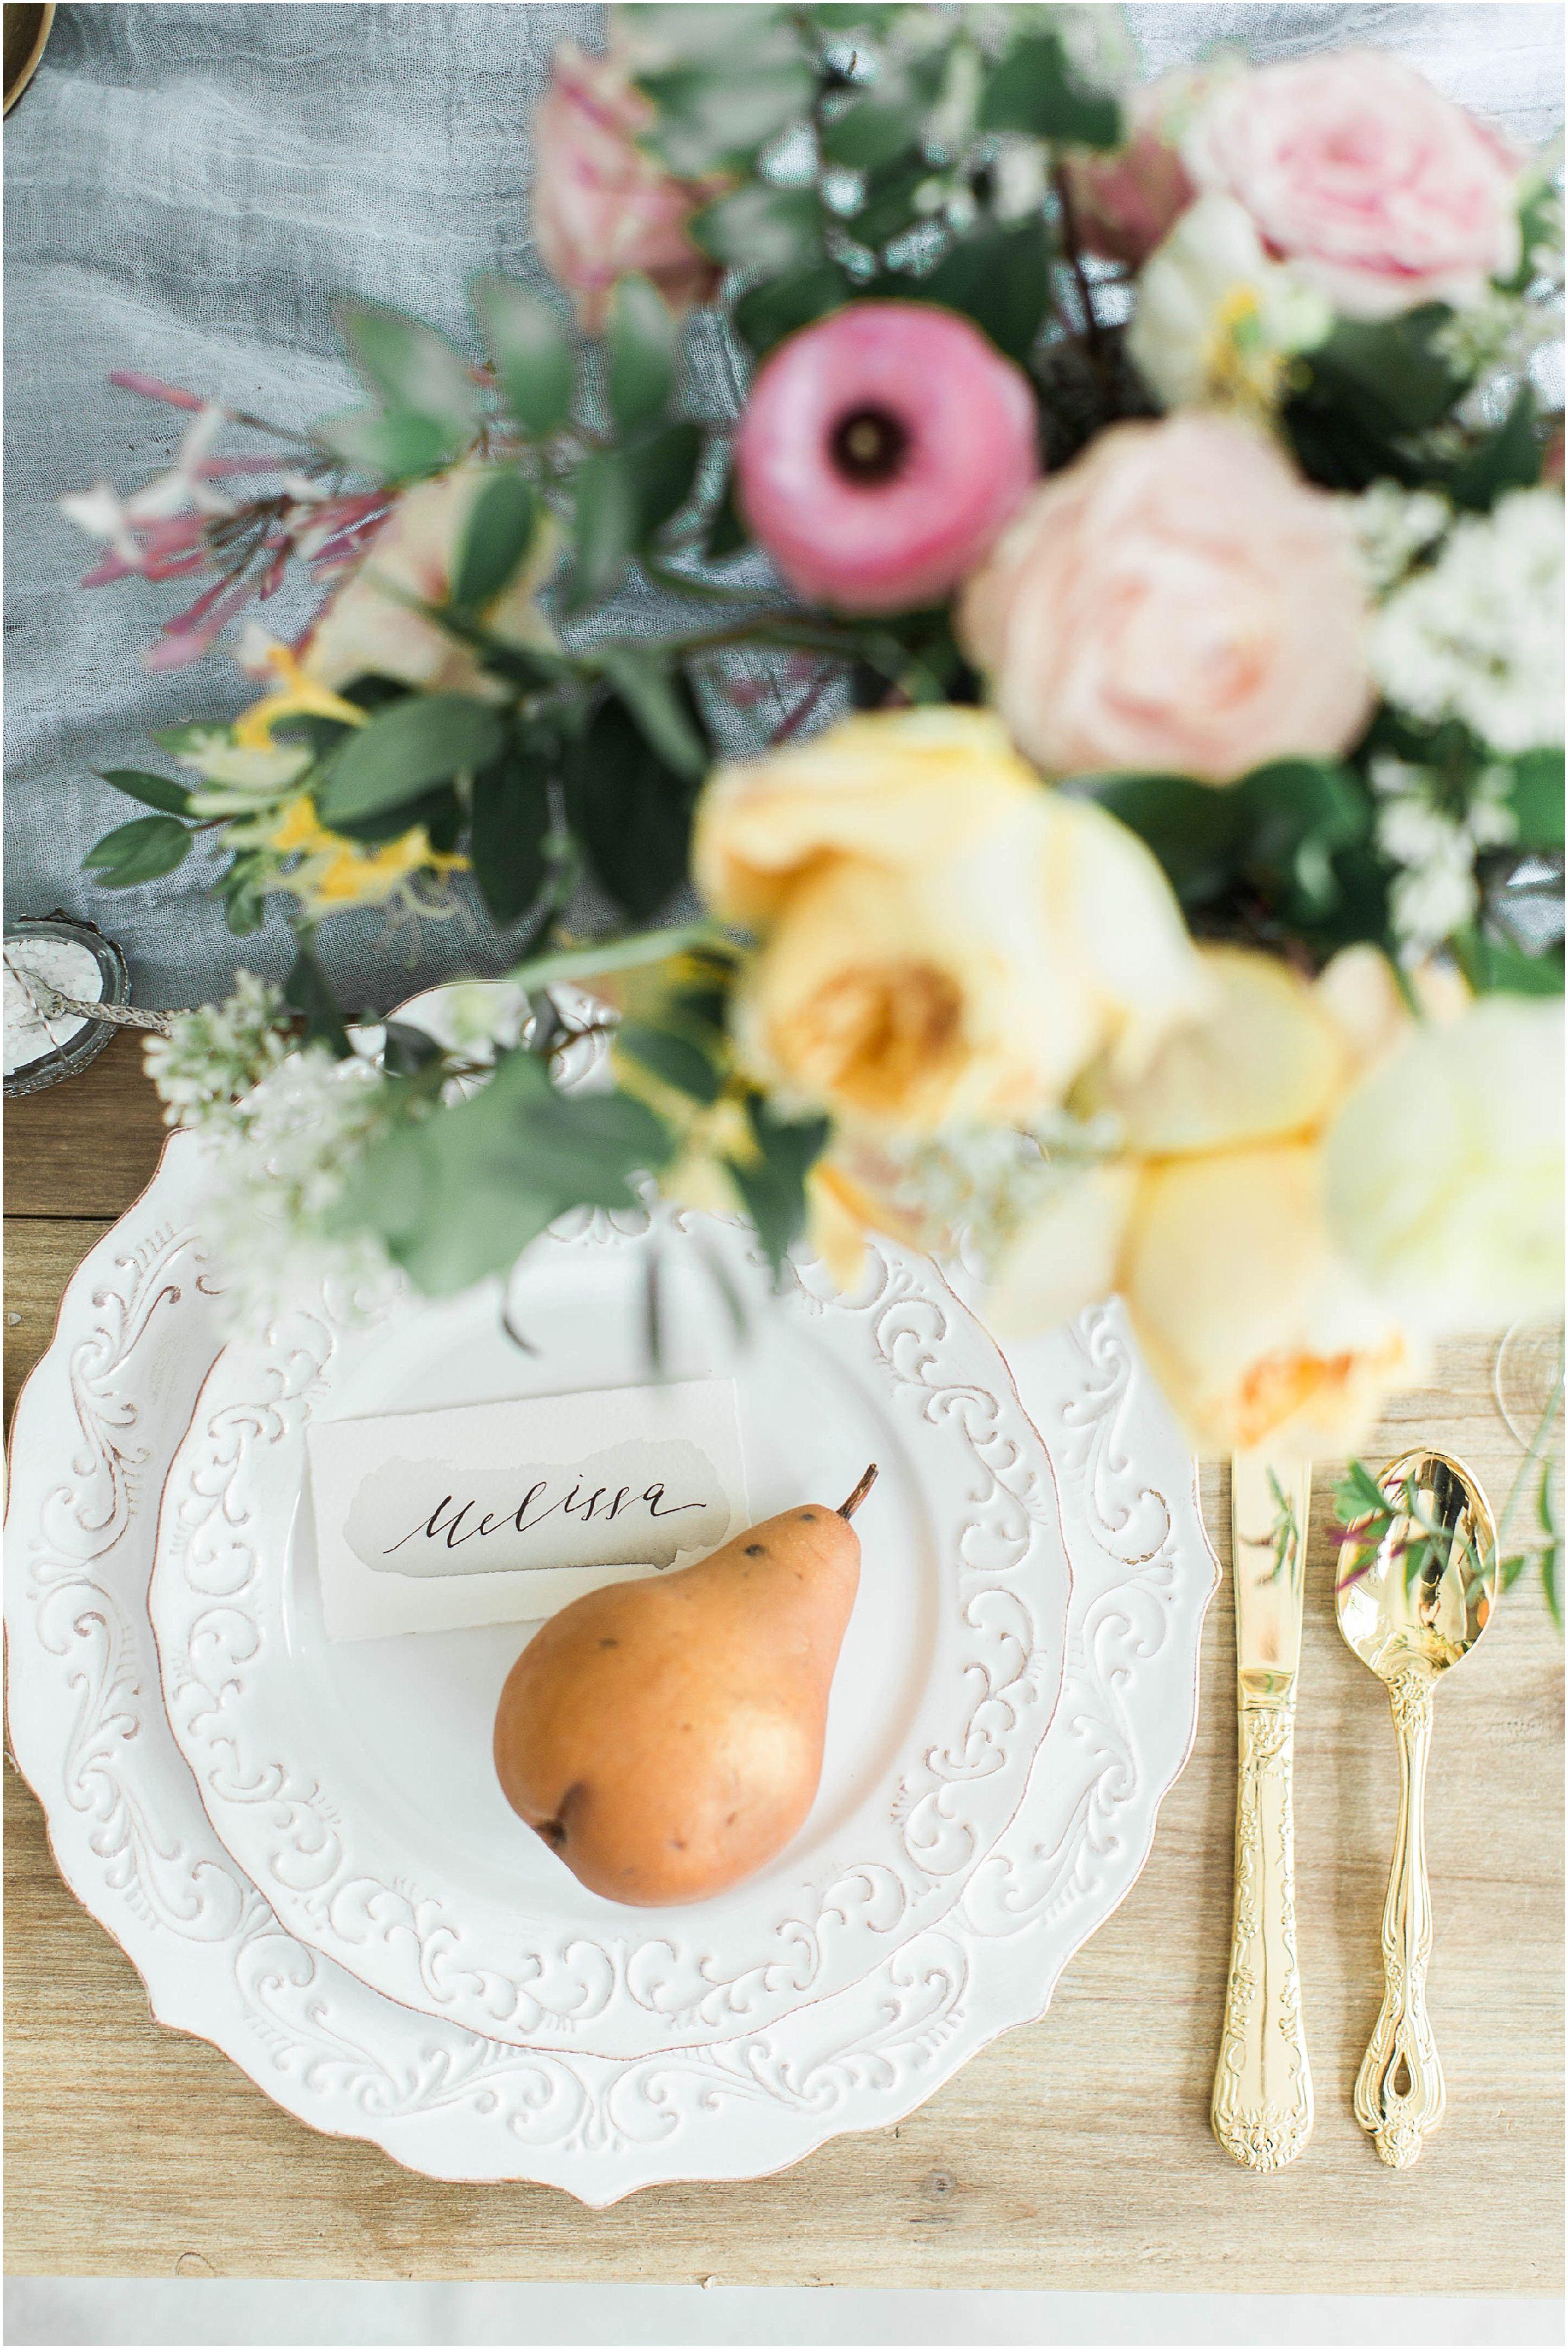 Dusty Blue Orange And Yellow Wedding Centerpiece Inspiration